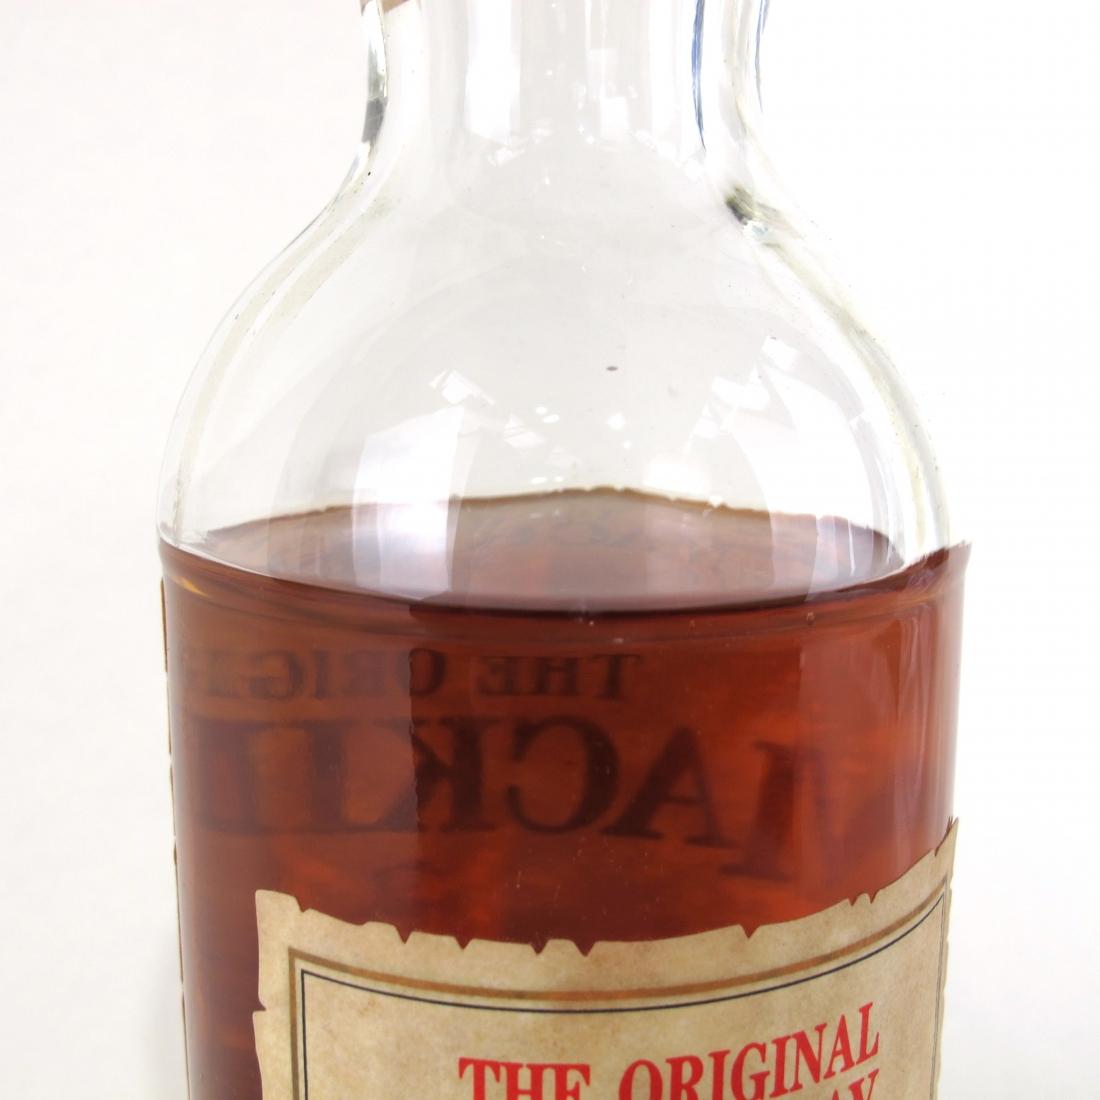 The Original Mackinlay